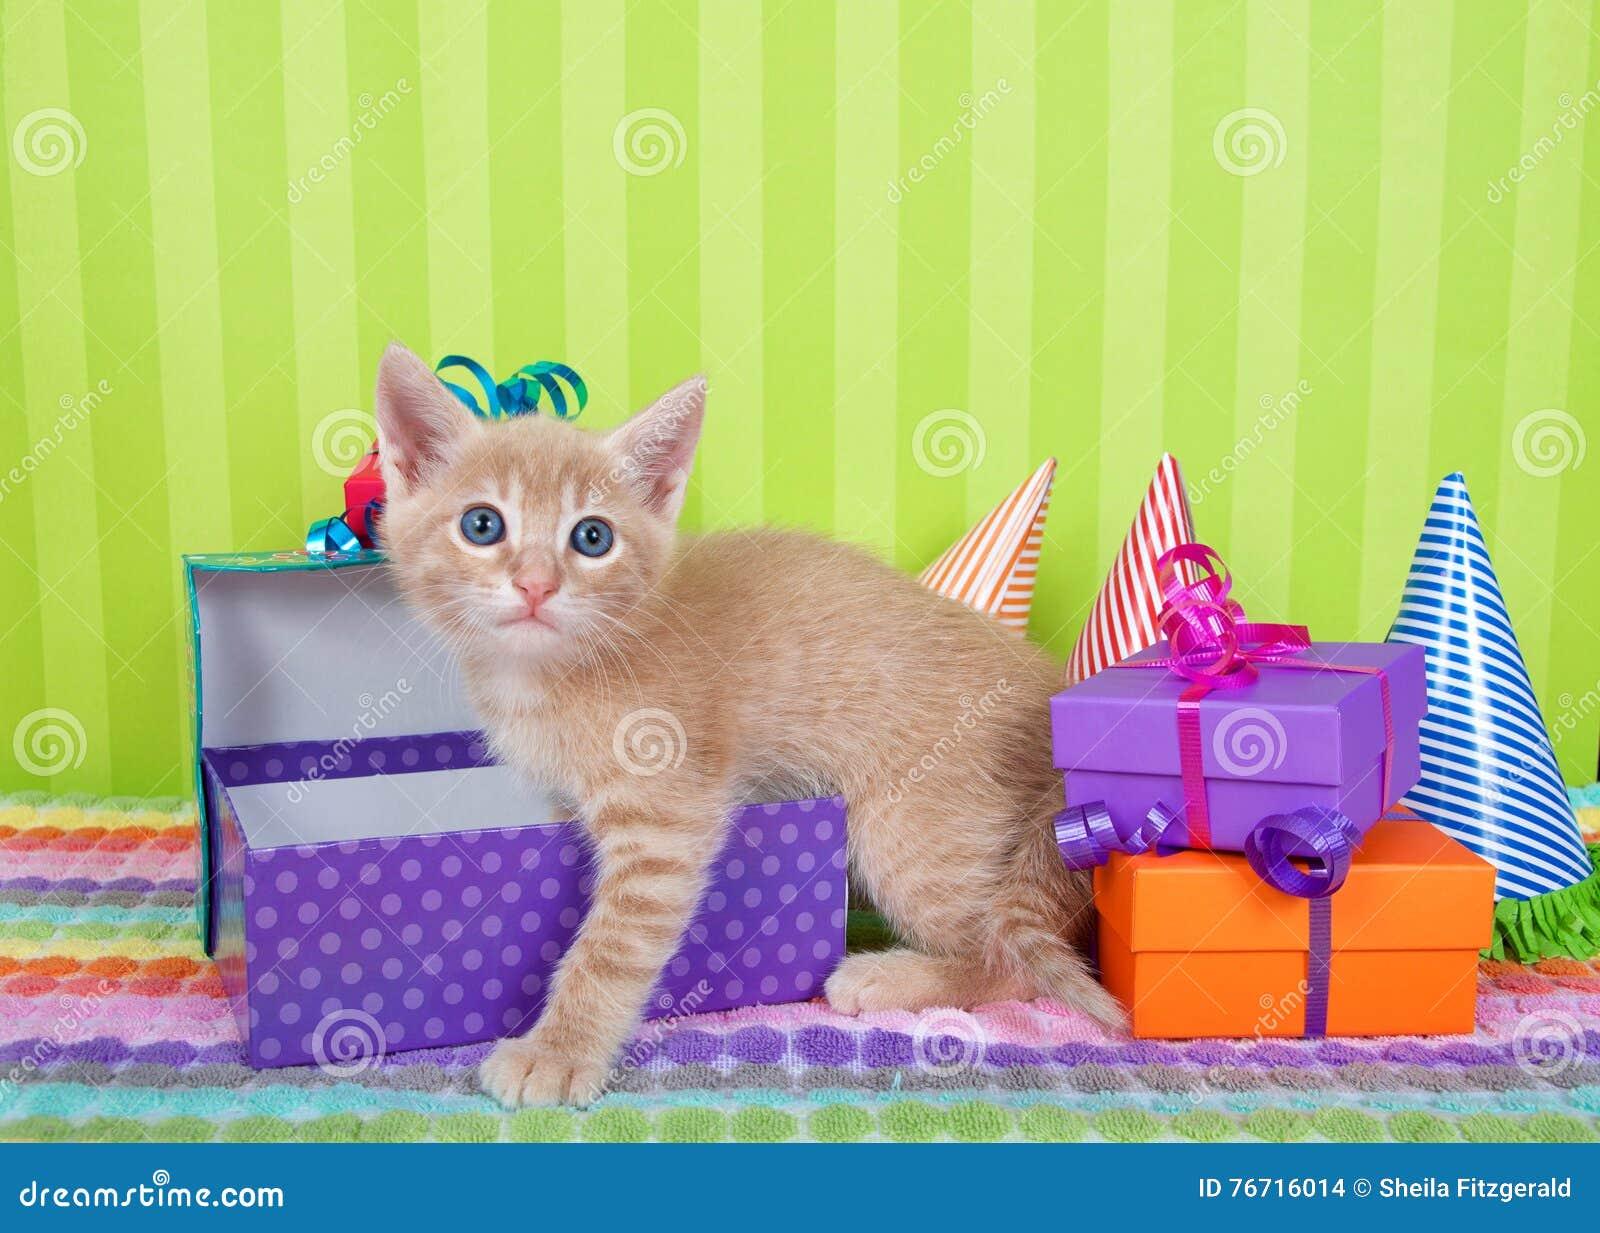 Orange Tabby Kitten Climbing Into Birthday Presents Stock Photo